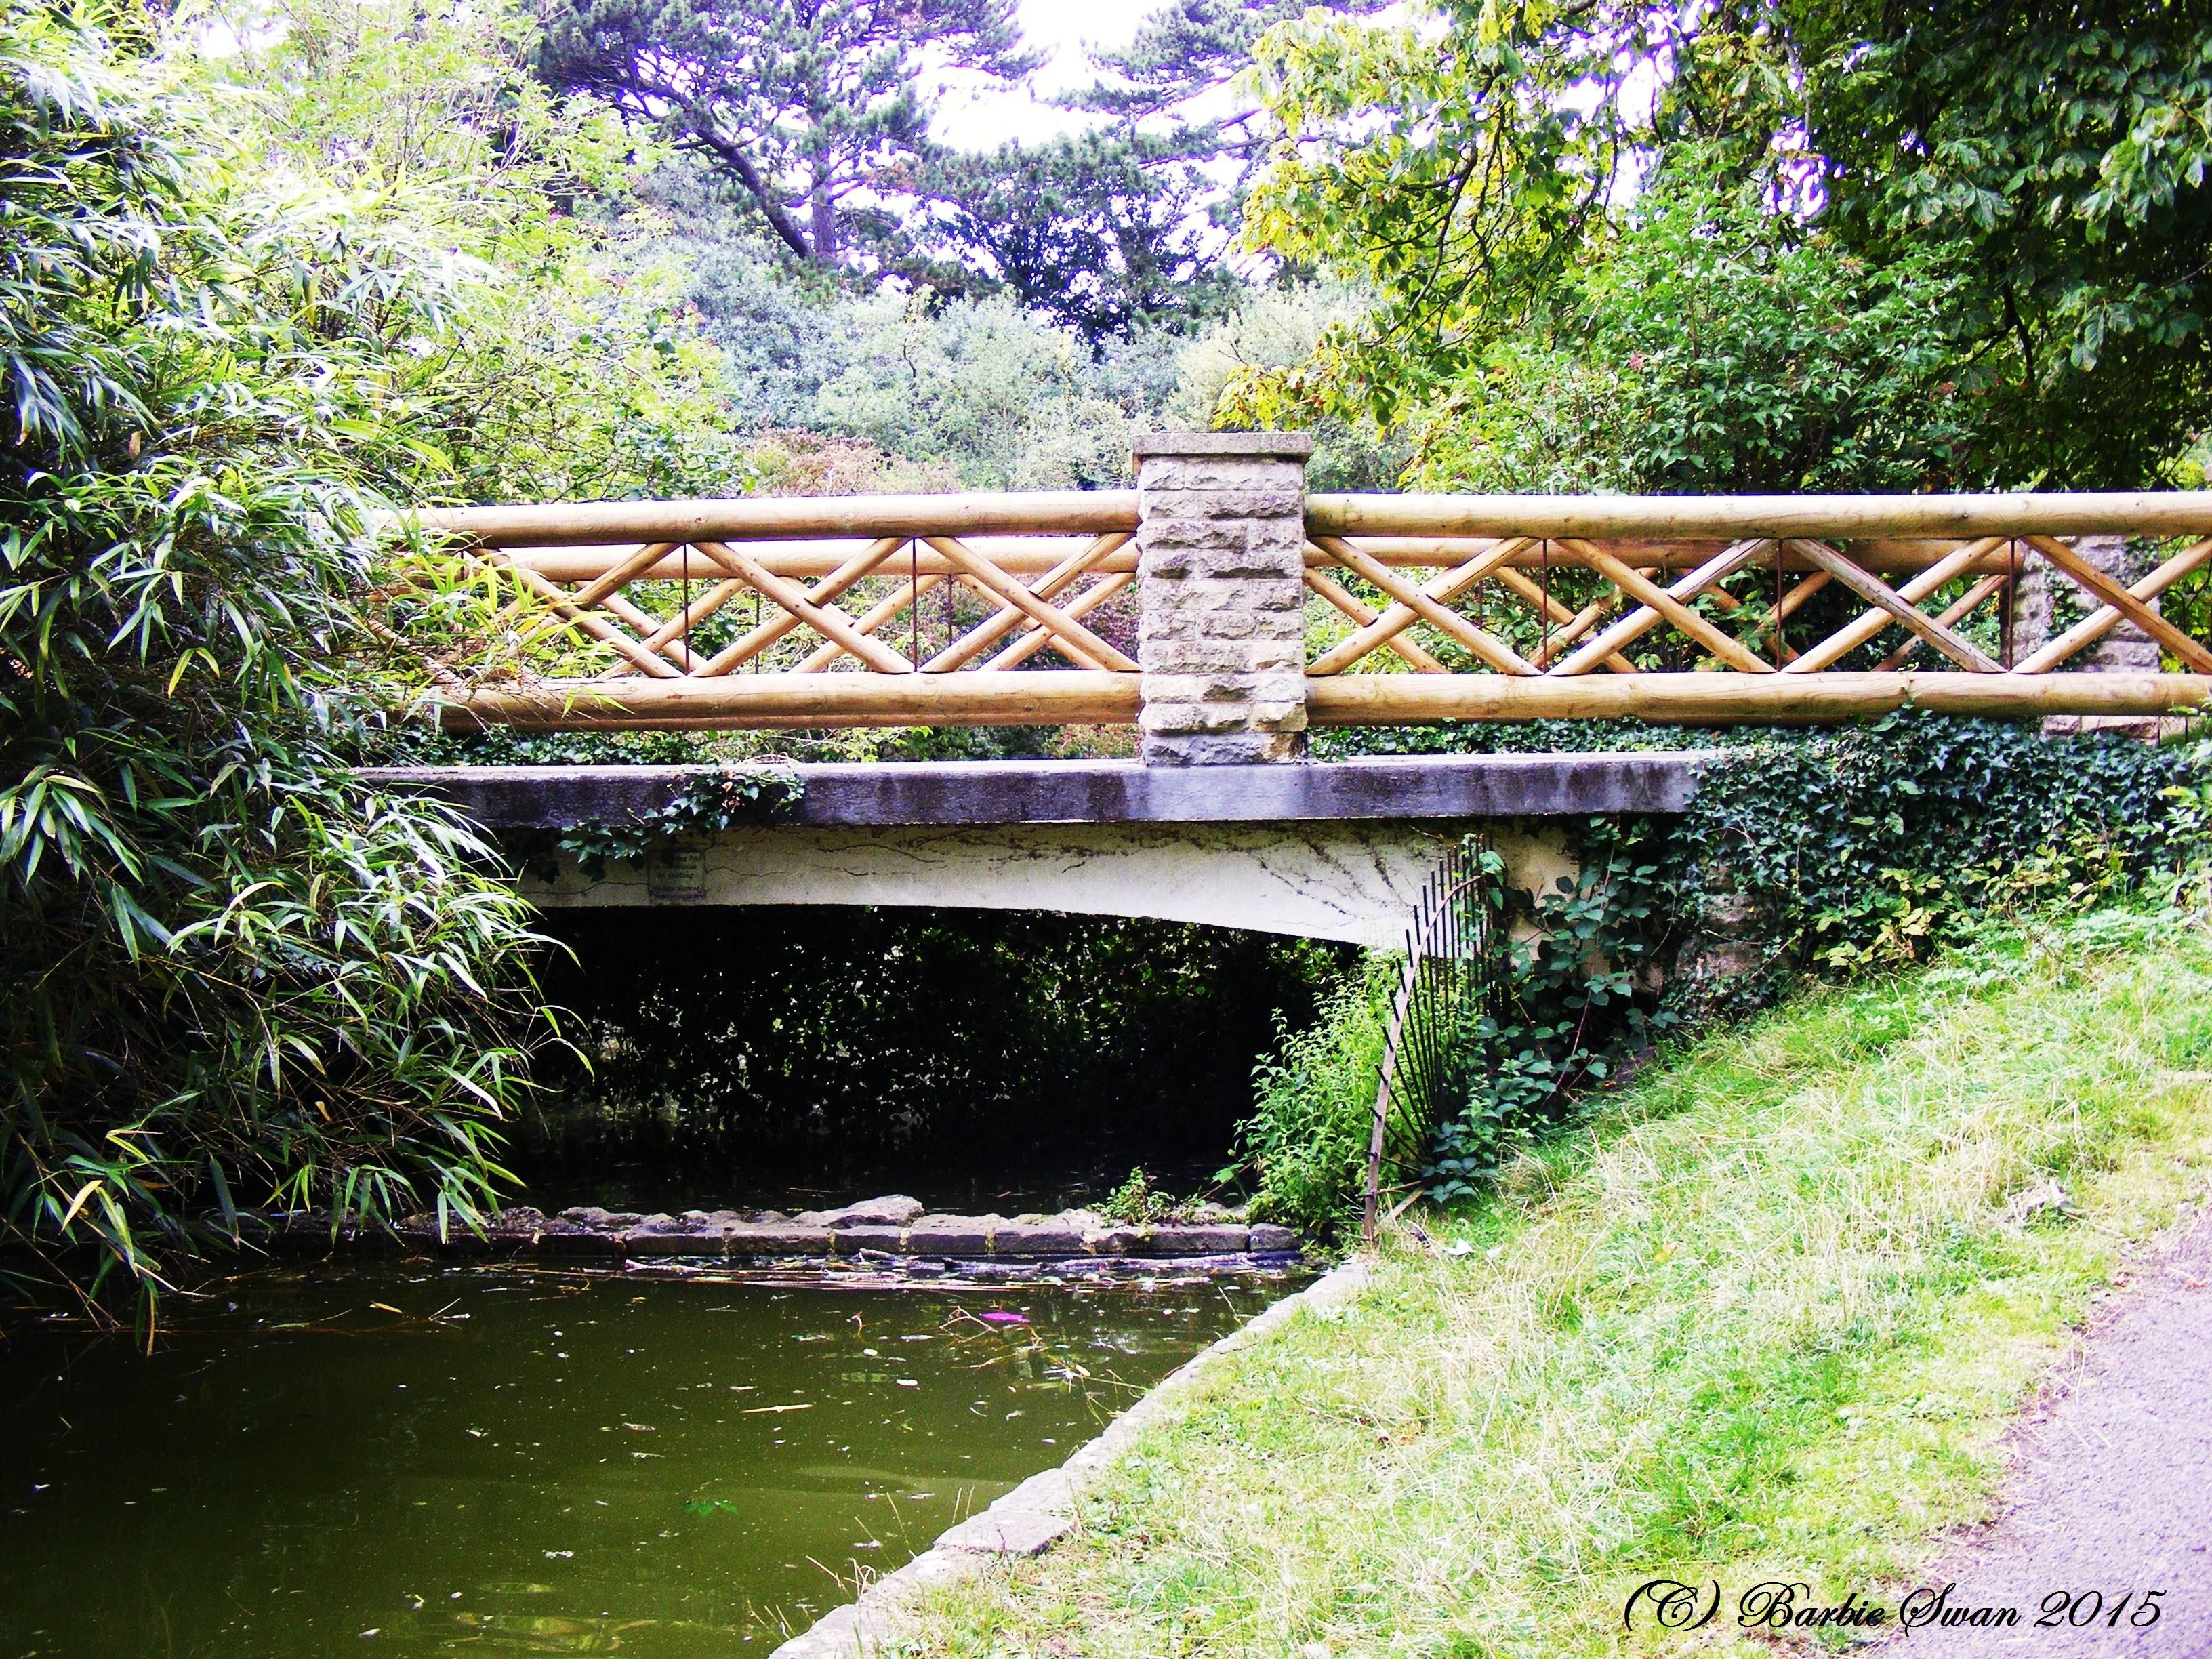 Wooden bridge seen in Royal Victoria park, Bath. Copyright (C ...